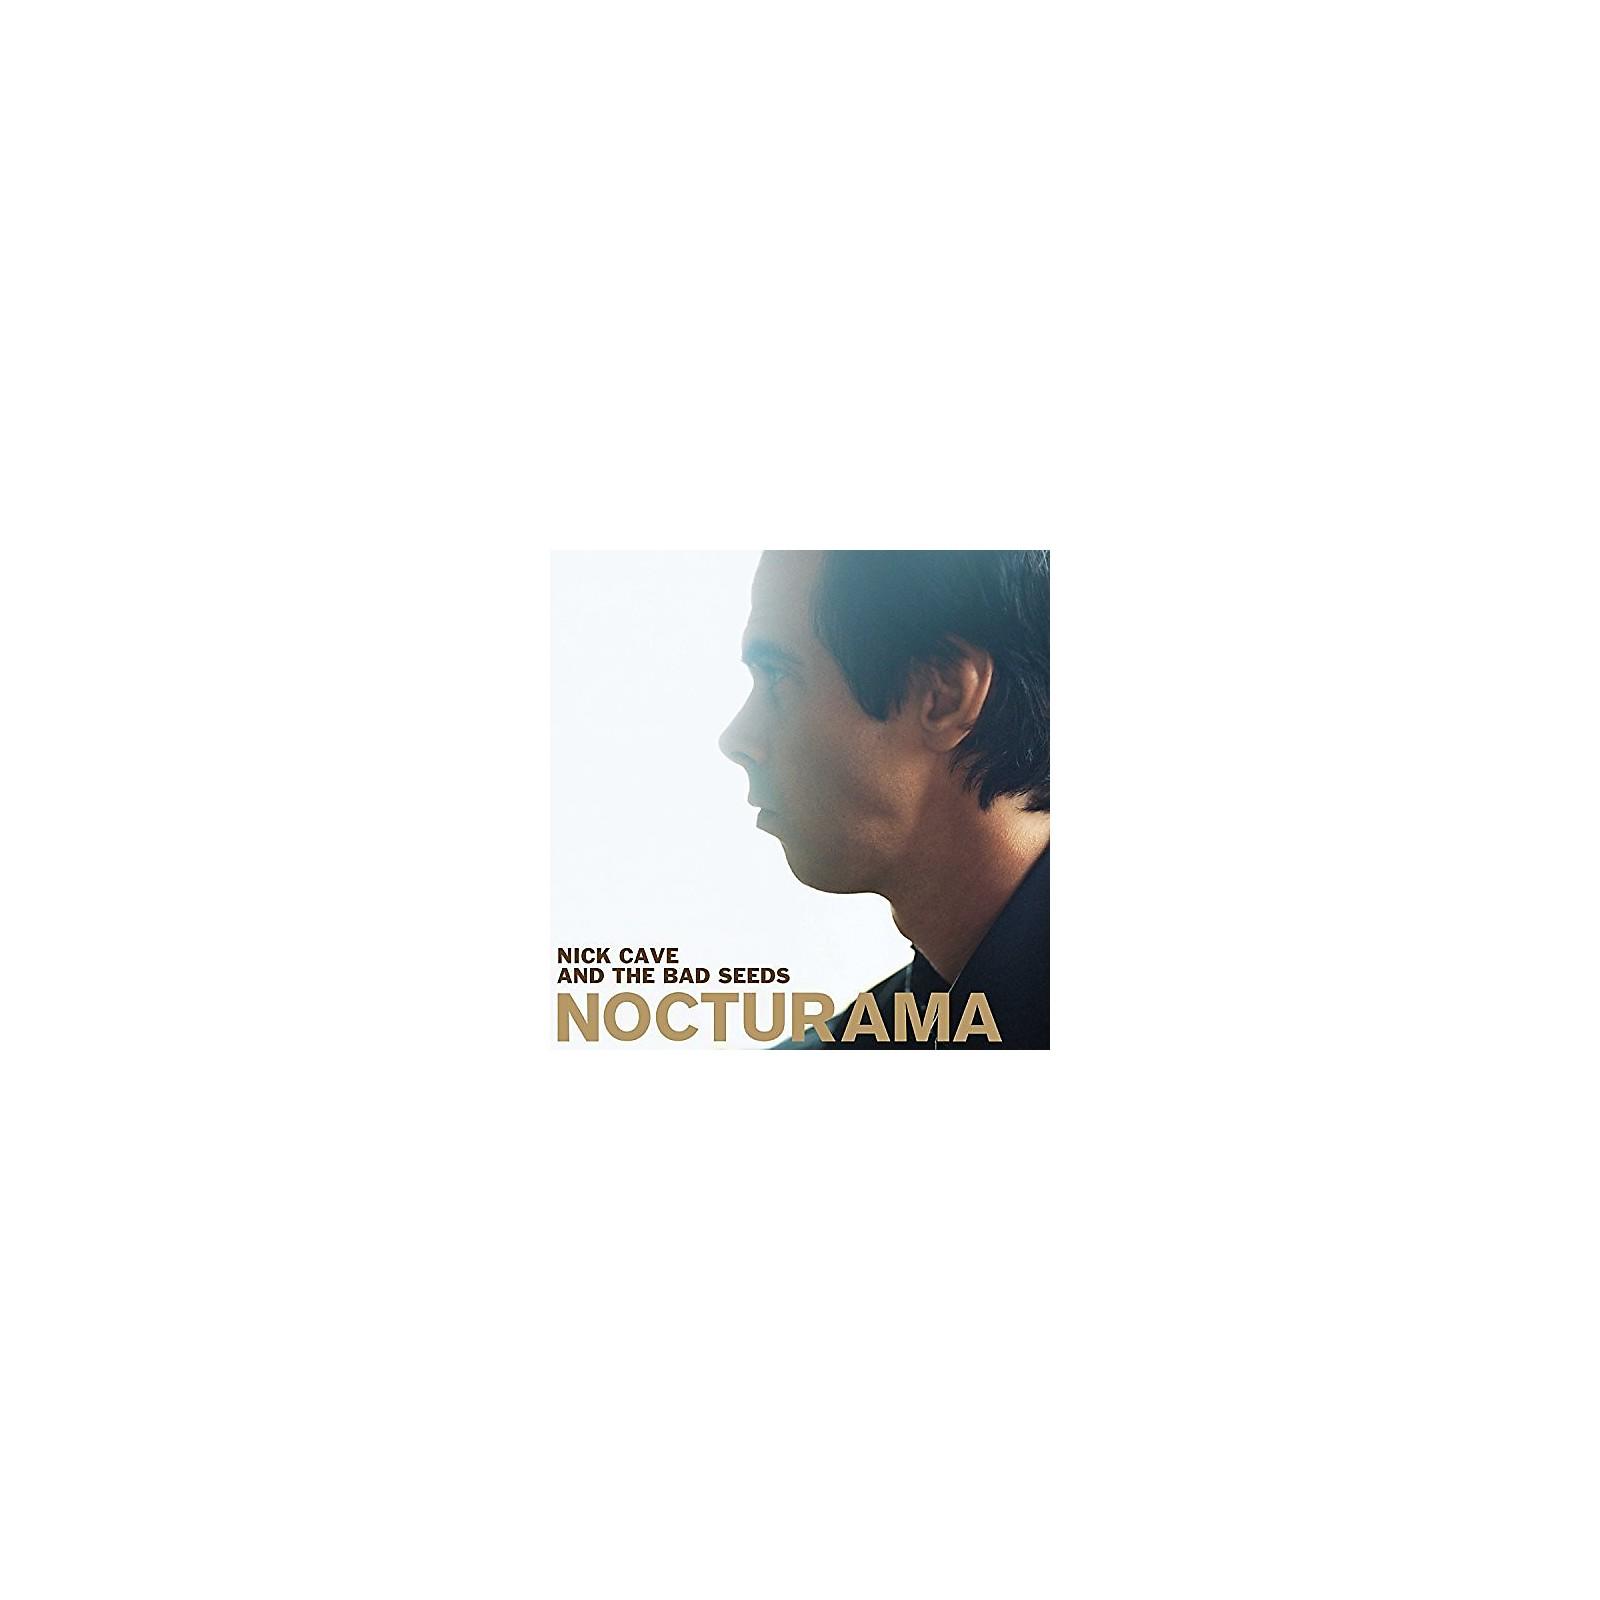 Alliance Nick Cave & Bad Seeds - Nocturama